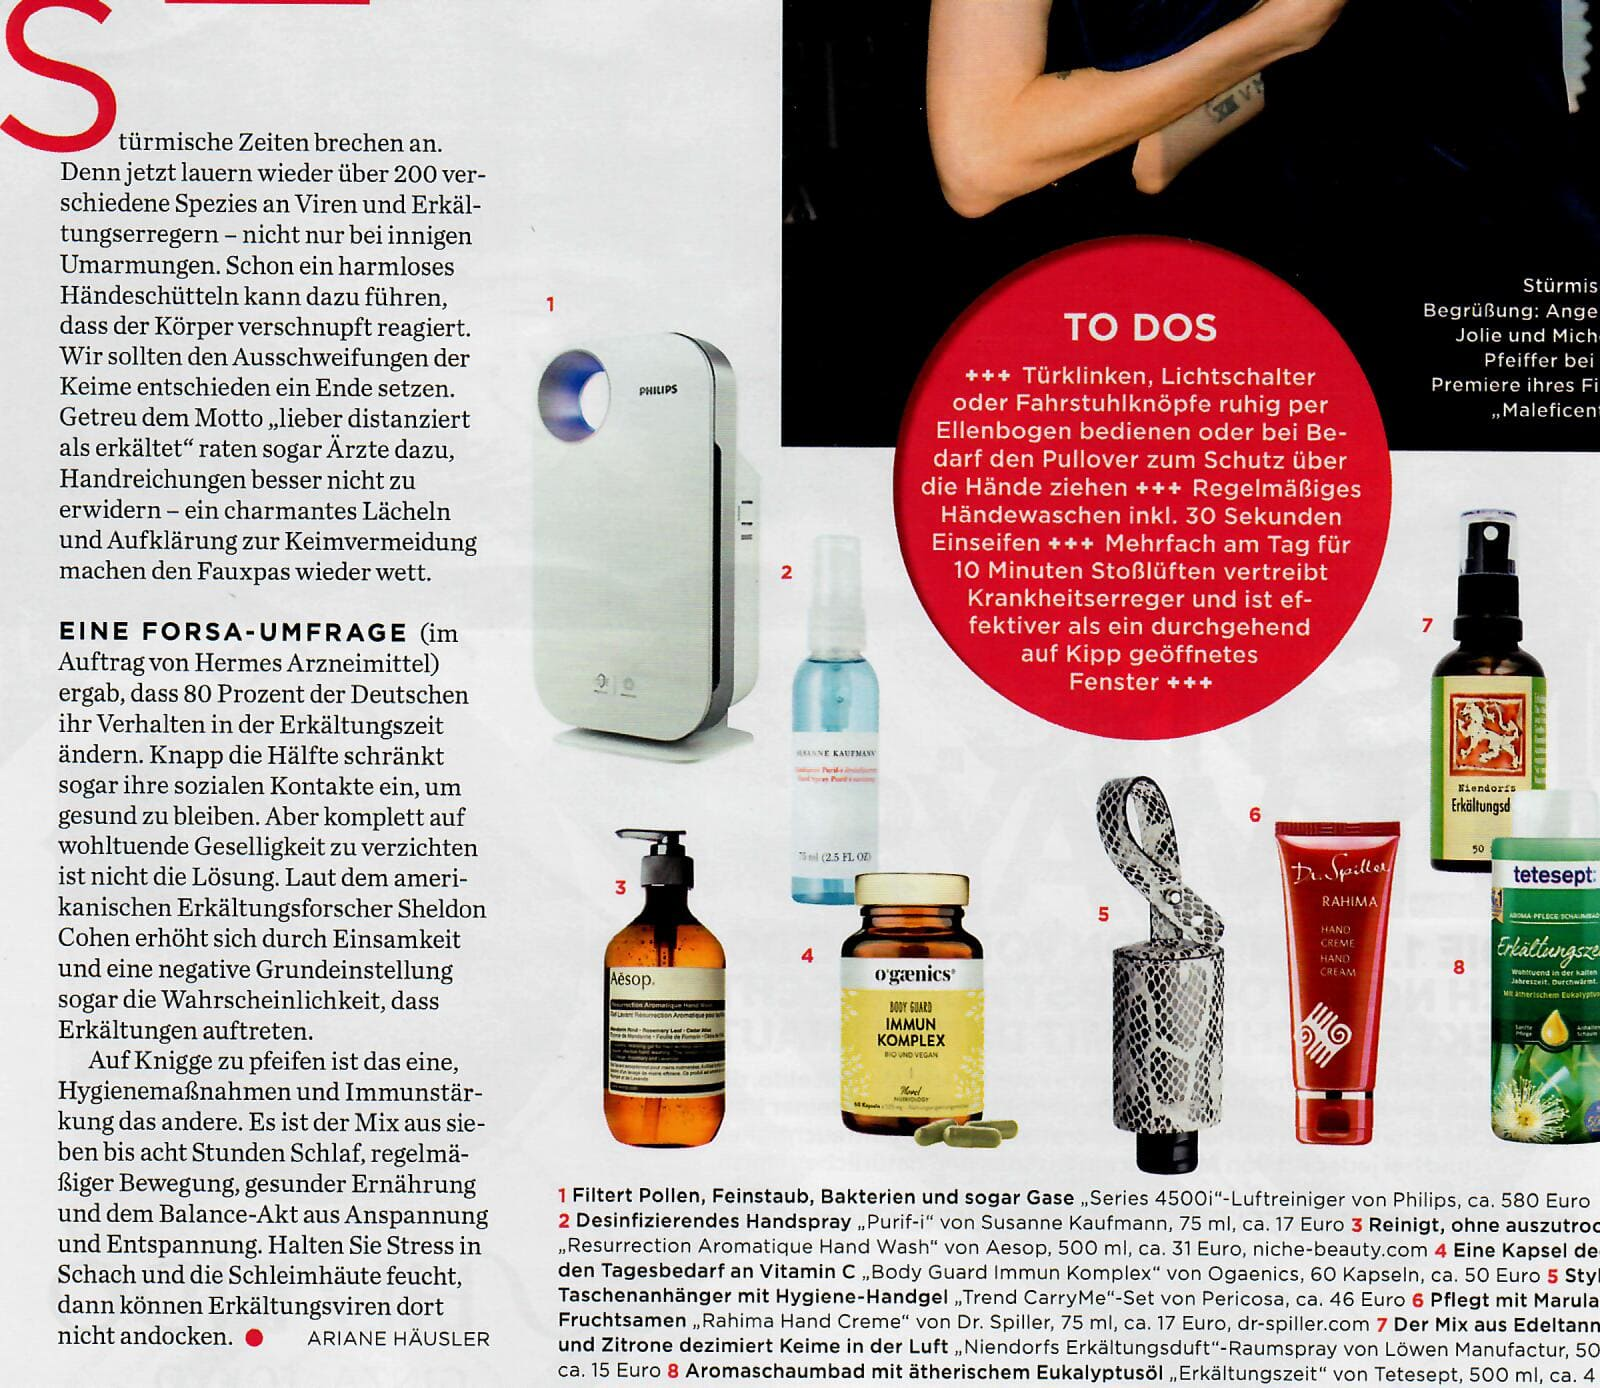 RefreshME Hygiene Handgel Gala Beauty Keime Leder-Etui